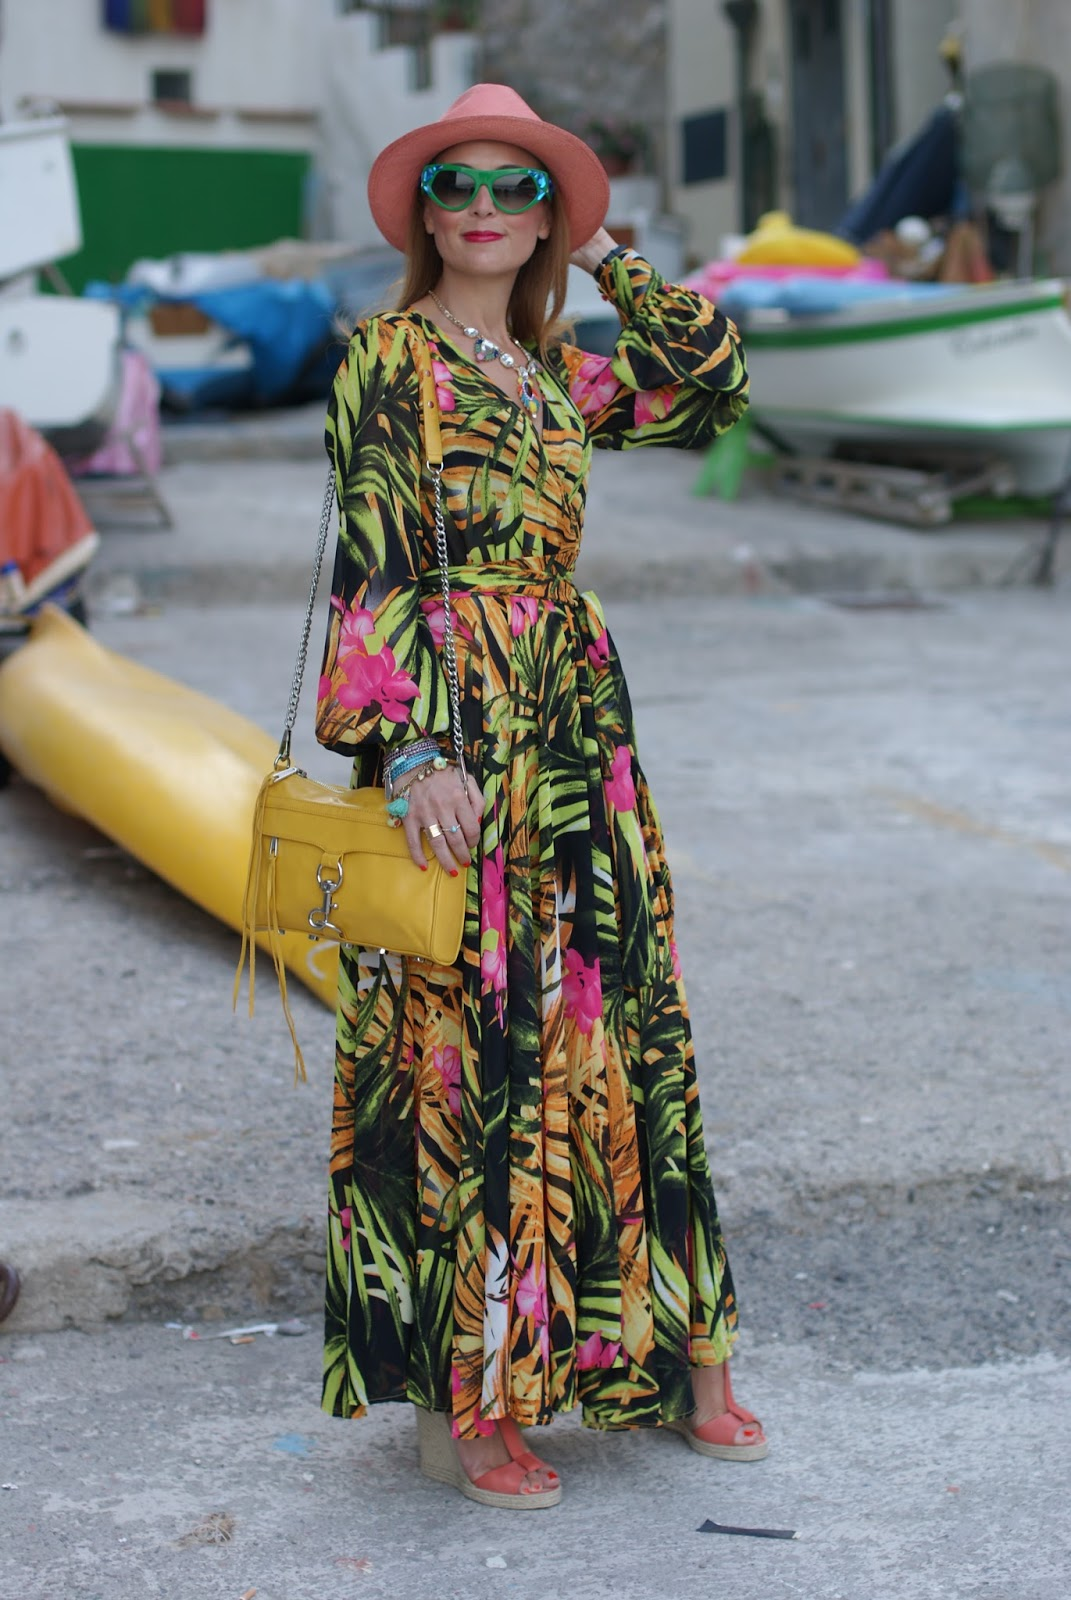 Prada voice sunglasses, walktrendy tropical print chiffon maxi dress, summer boho style on Fashion and Cookies fashion blog, fashion blogger style